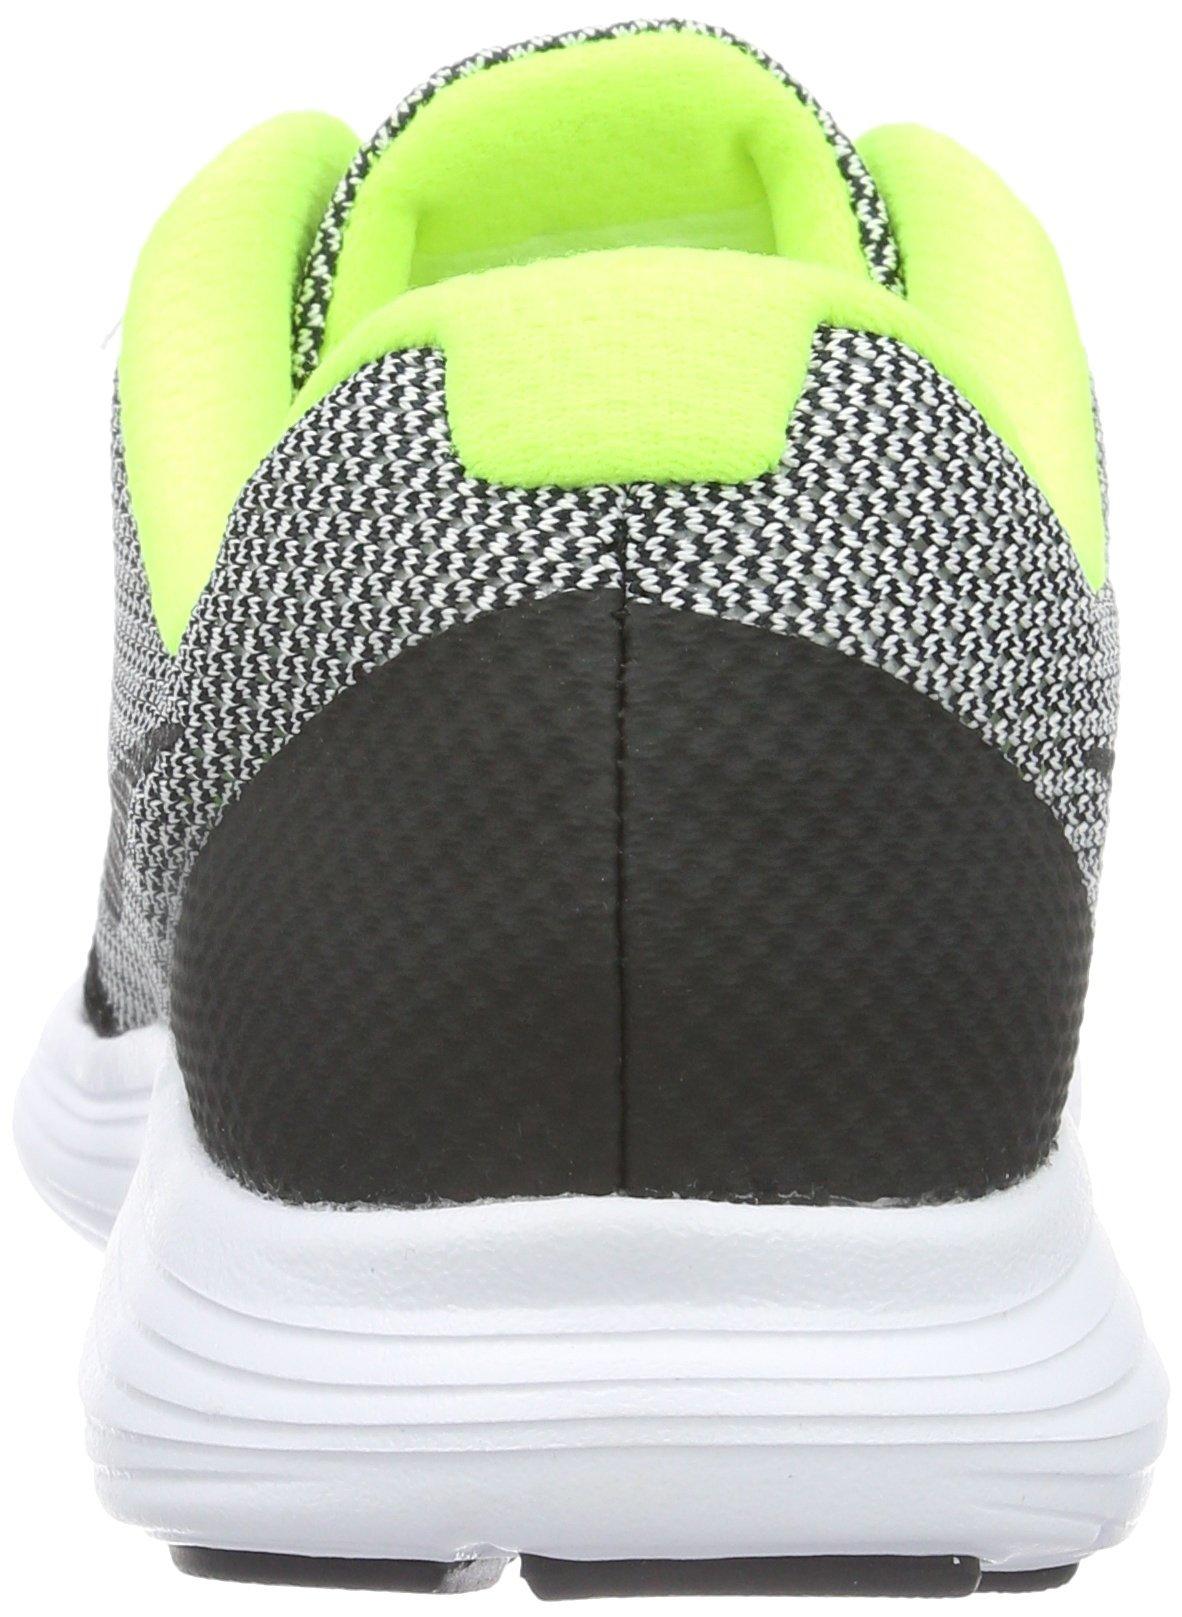 Nike Boys' Revolution 3 (GS) Running Shoe Black/White/Volt, 4.5 M US Big Kid by Nike (Image #2)